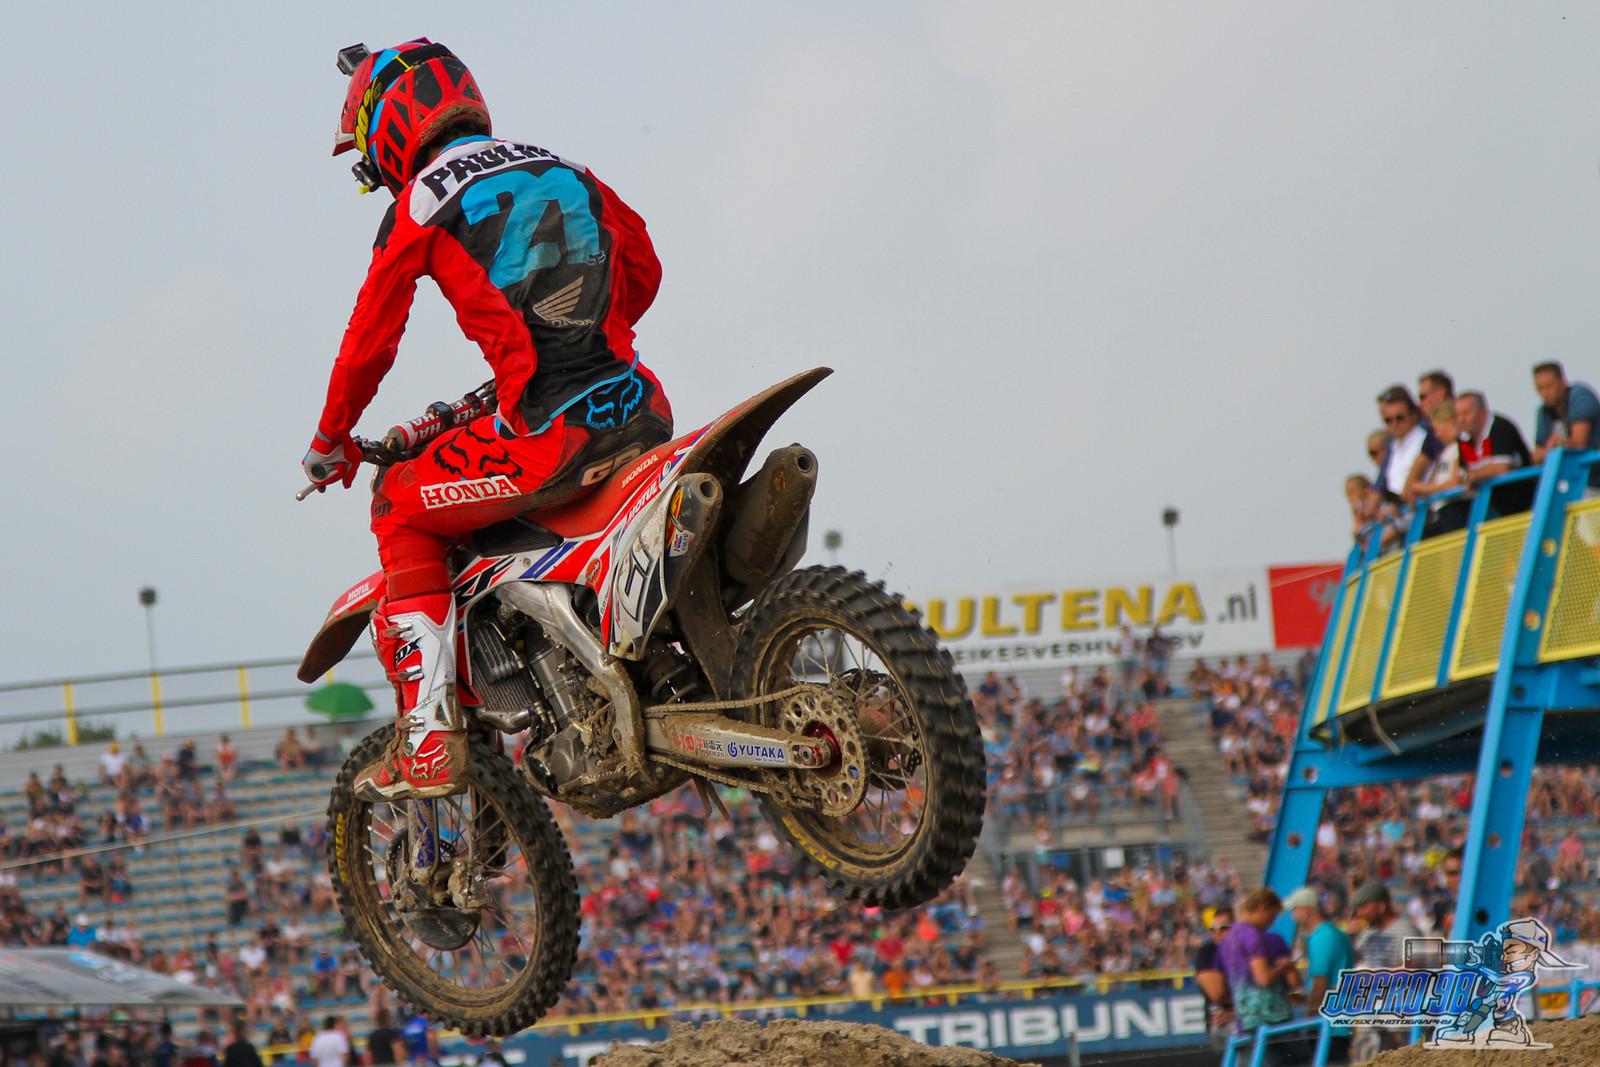 Gautier Paulin - Photo Gallery: MXGP of the Netherlands - Motocross Pictures - Vital MX